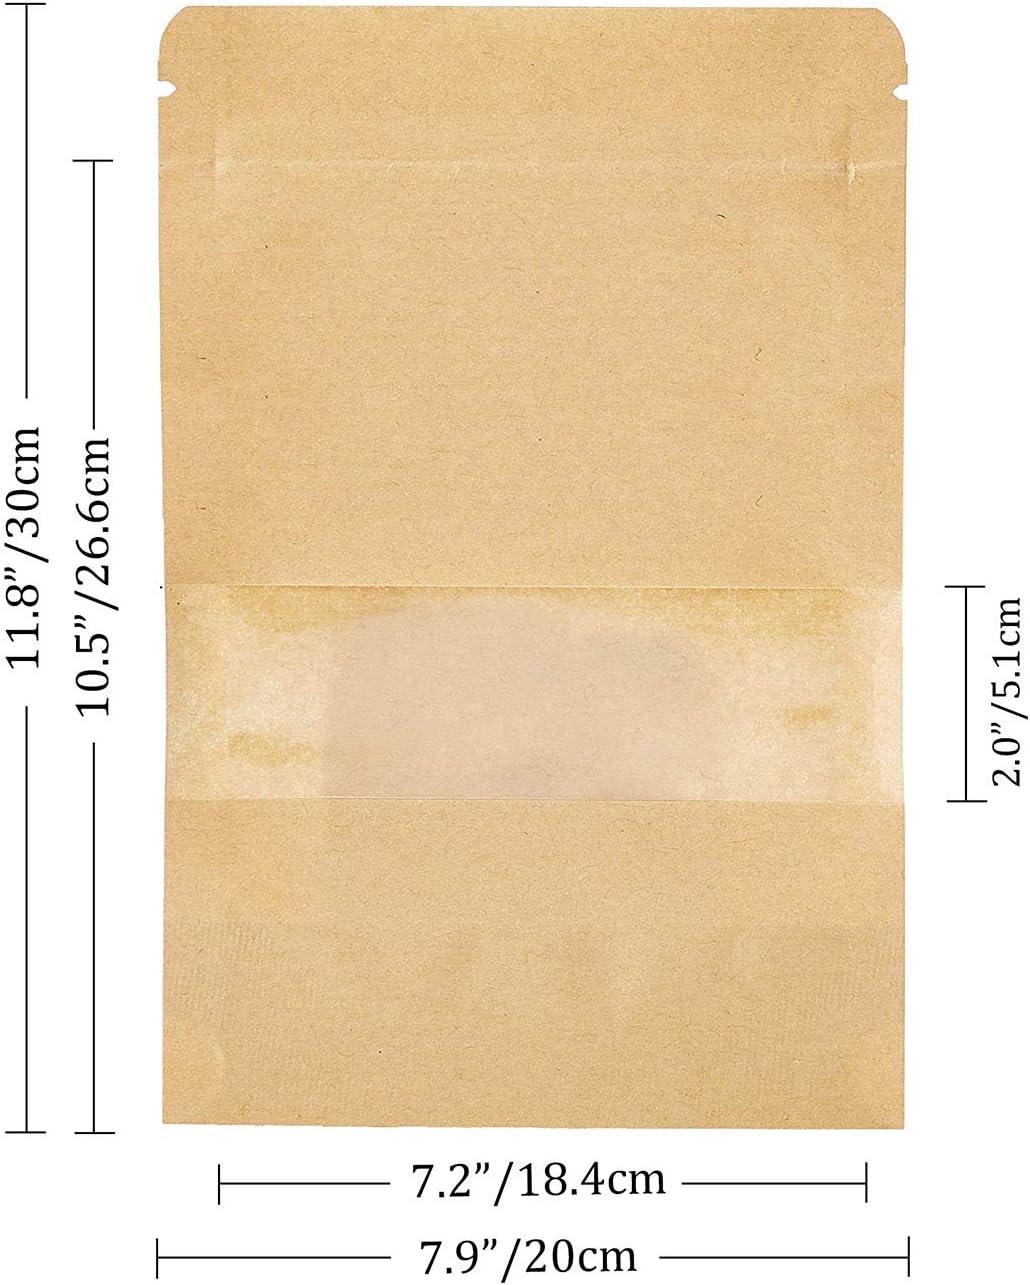 meridy Bolsa de Papel Kraft Reutilizables Marr/ón Ziplock Auto Sellante Stand Up con Ventana Transparente Impermeables Aplicar DIY T/é Granos de Caf/é Tea Almacenamiento de Alimentos100Pcs 9 14cm